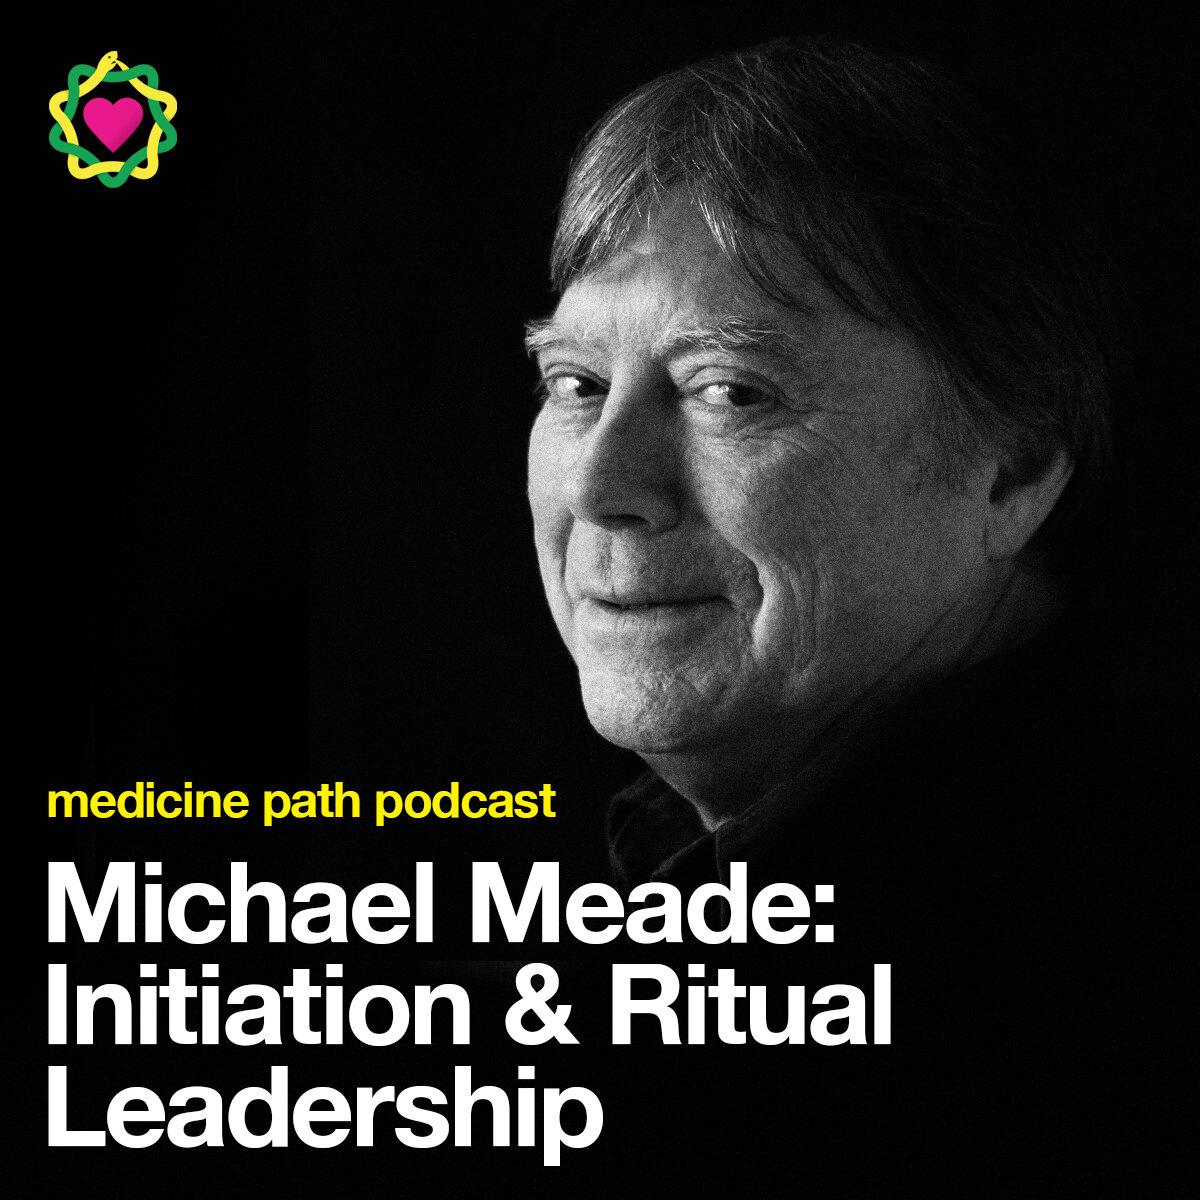 MPP72 Michael Meade: Initiation & Ritual Leadership